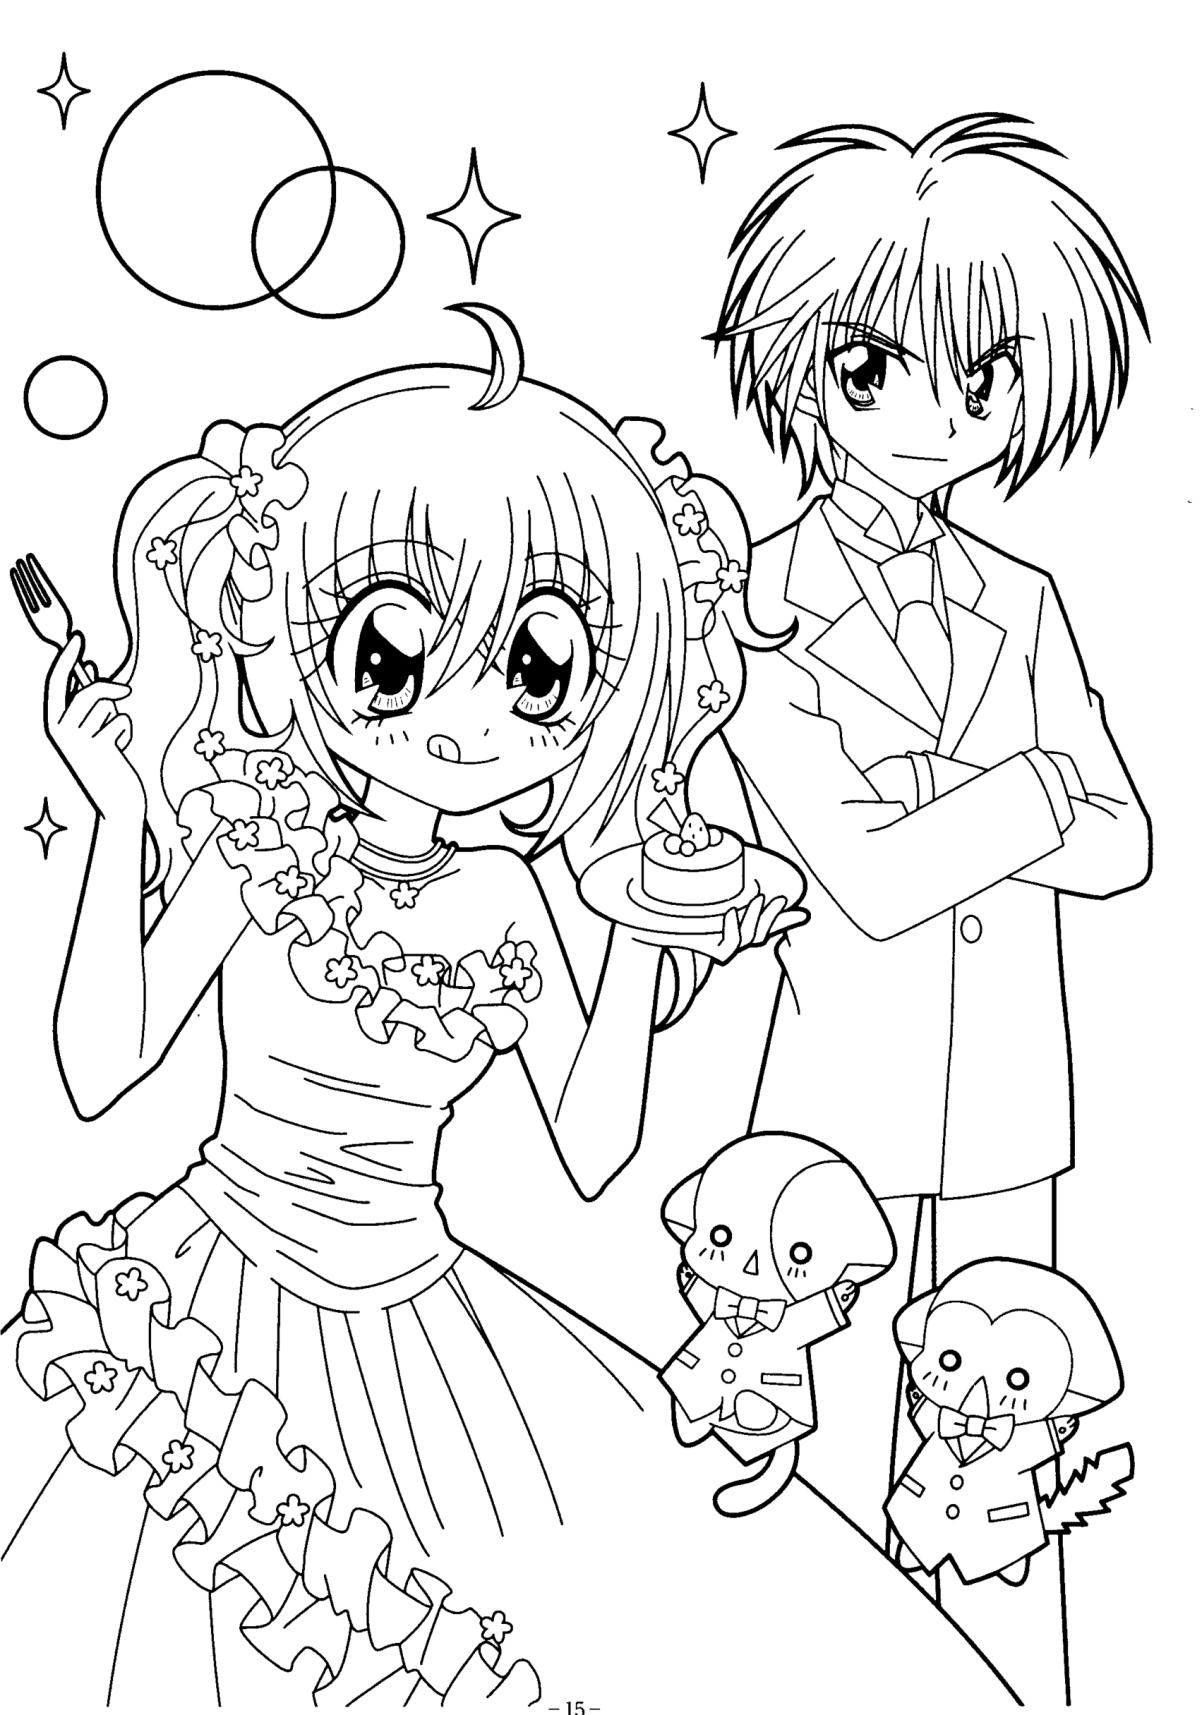 Coloriage Kilari Manga À Imprimer à Coloriage Manga A Imprimer